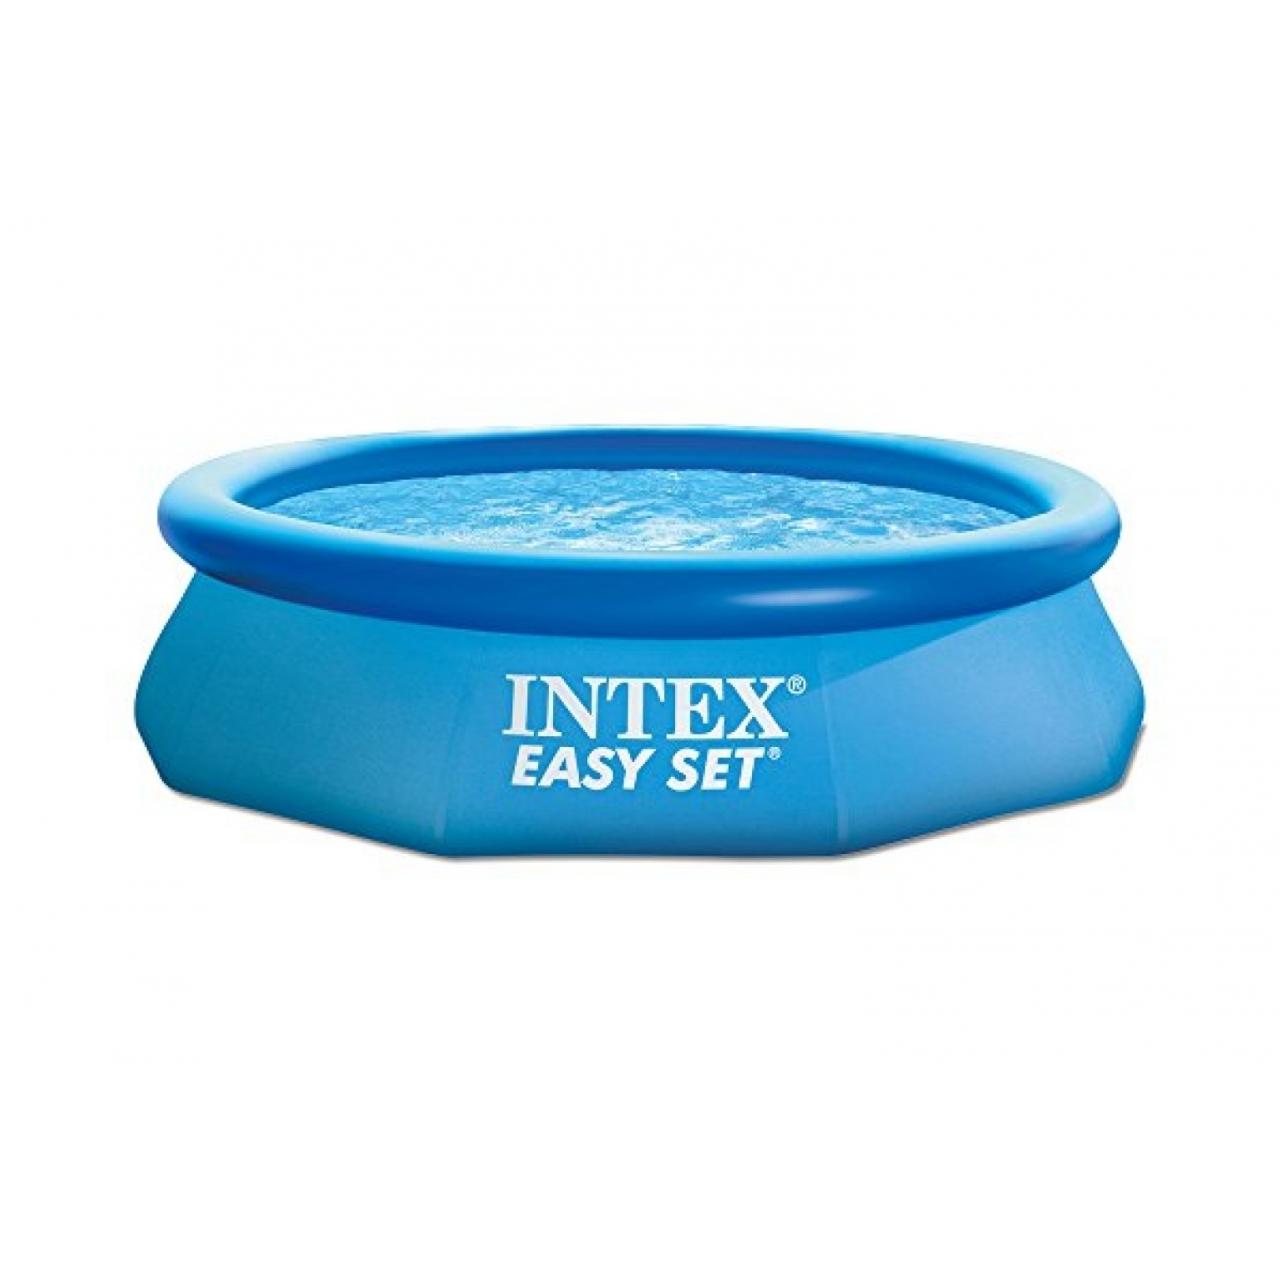 Intex easy set pool test for Gartenpool eingebaut